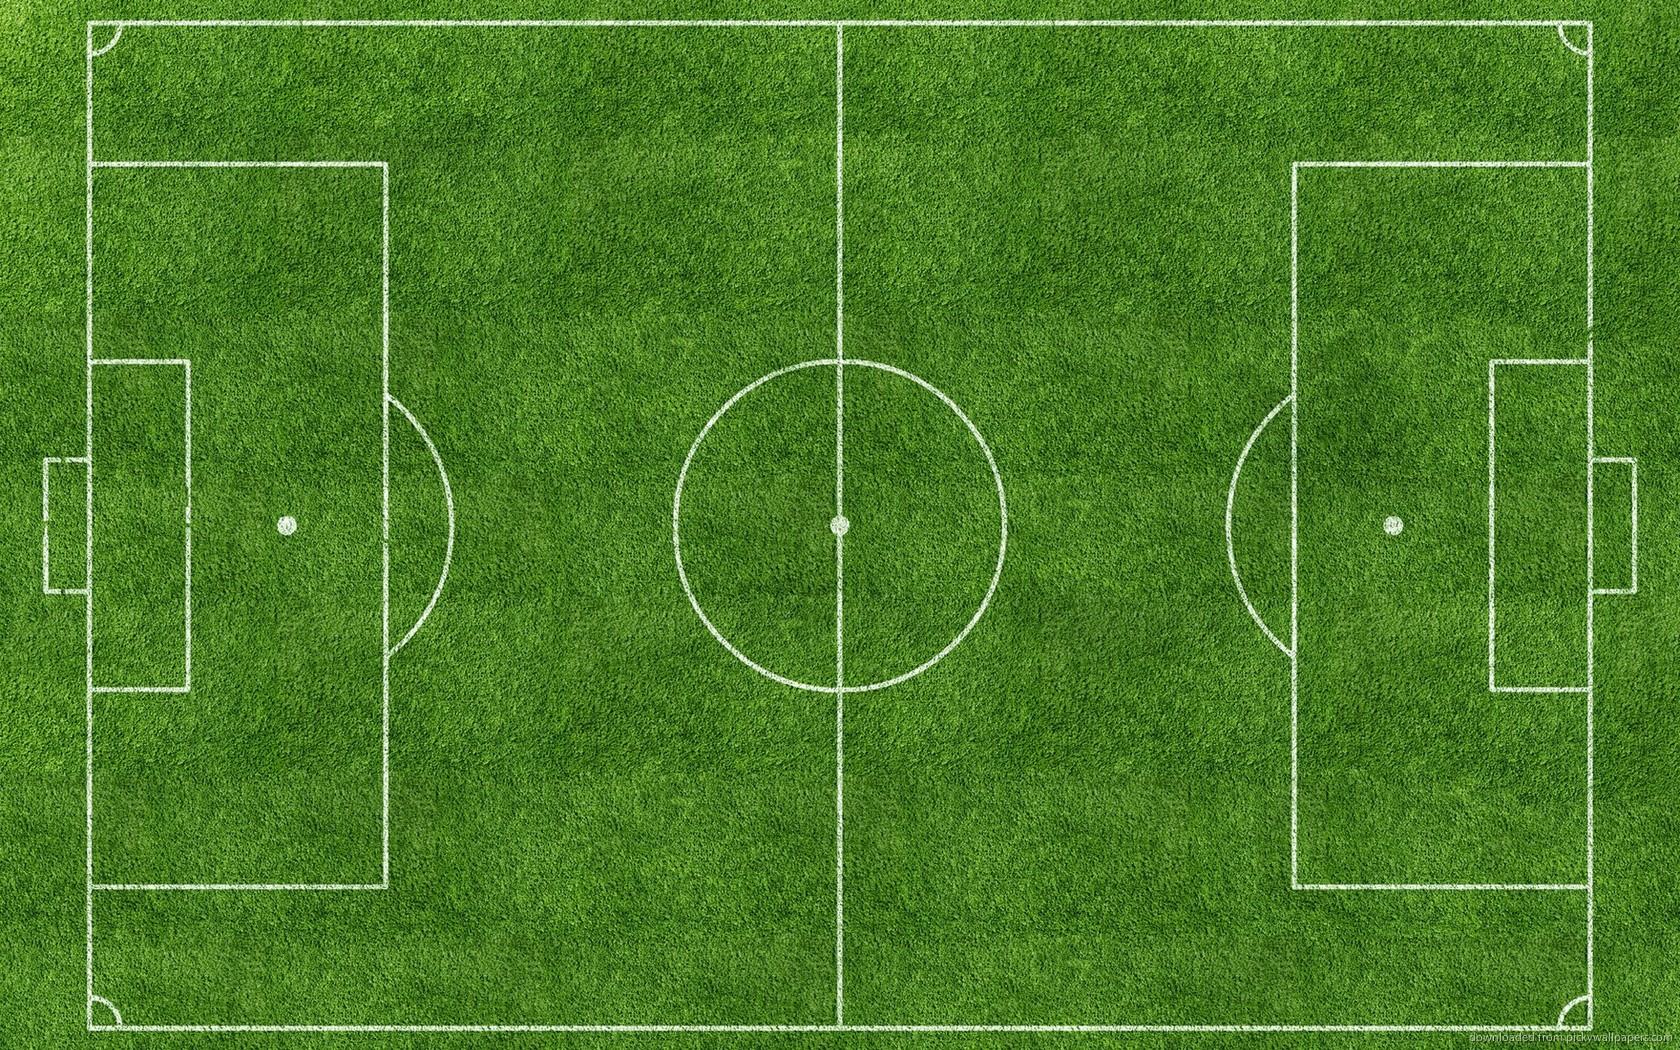 Sportsball map